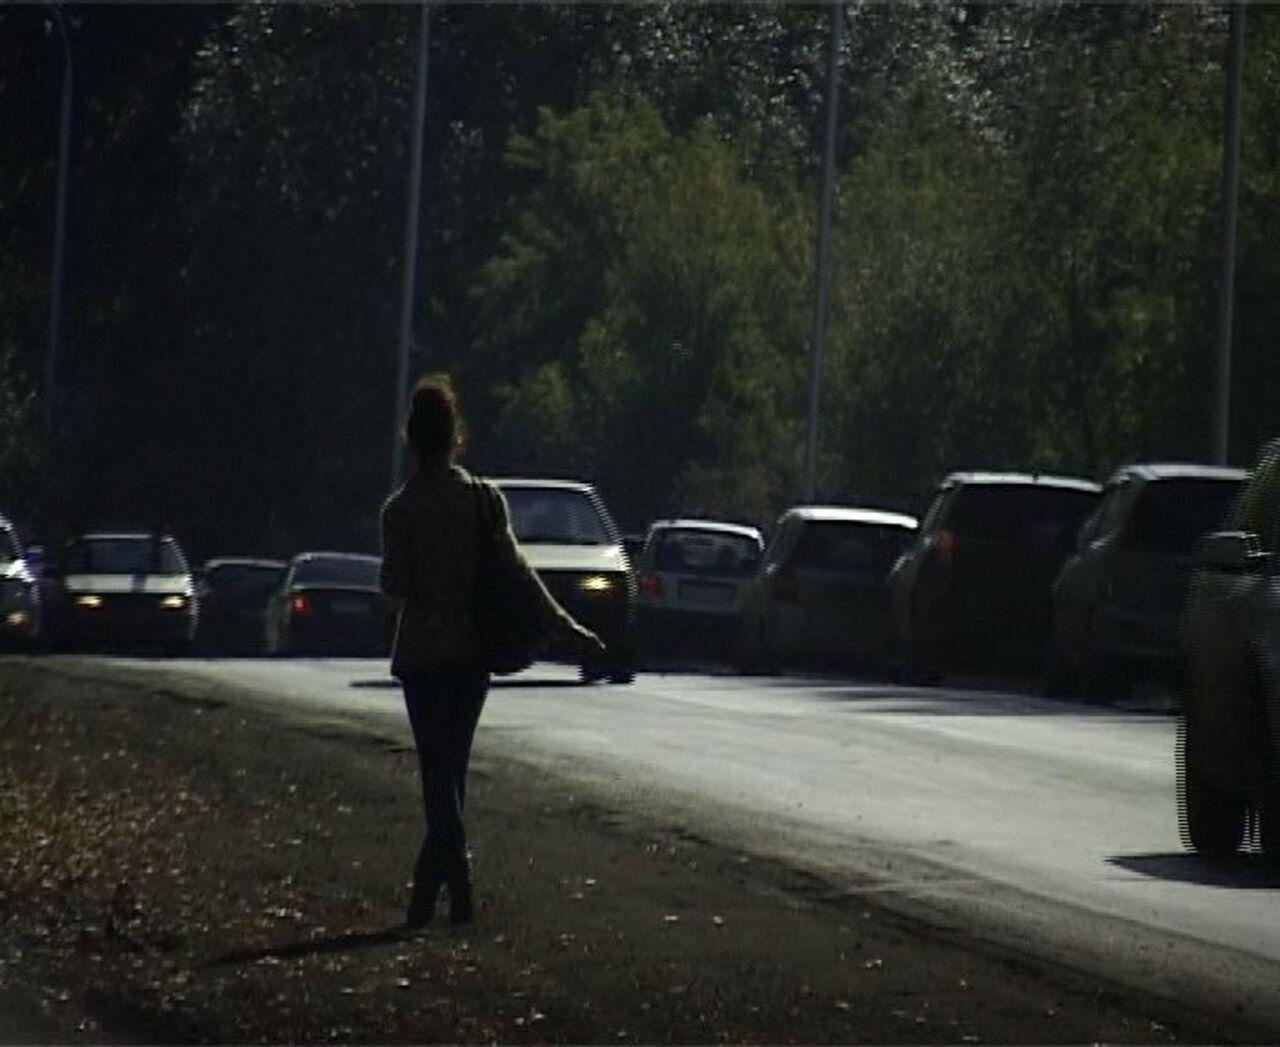 Путаны на трассе москвы 13 фотография